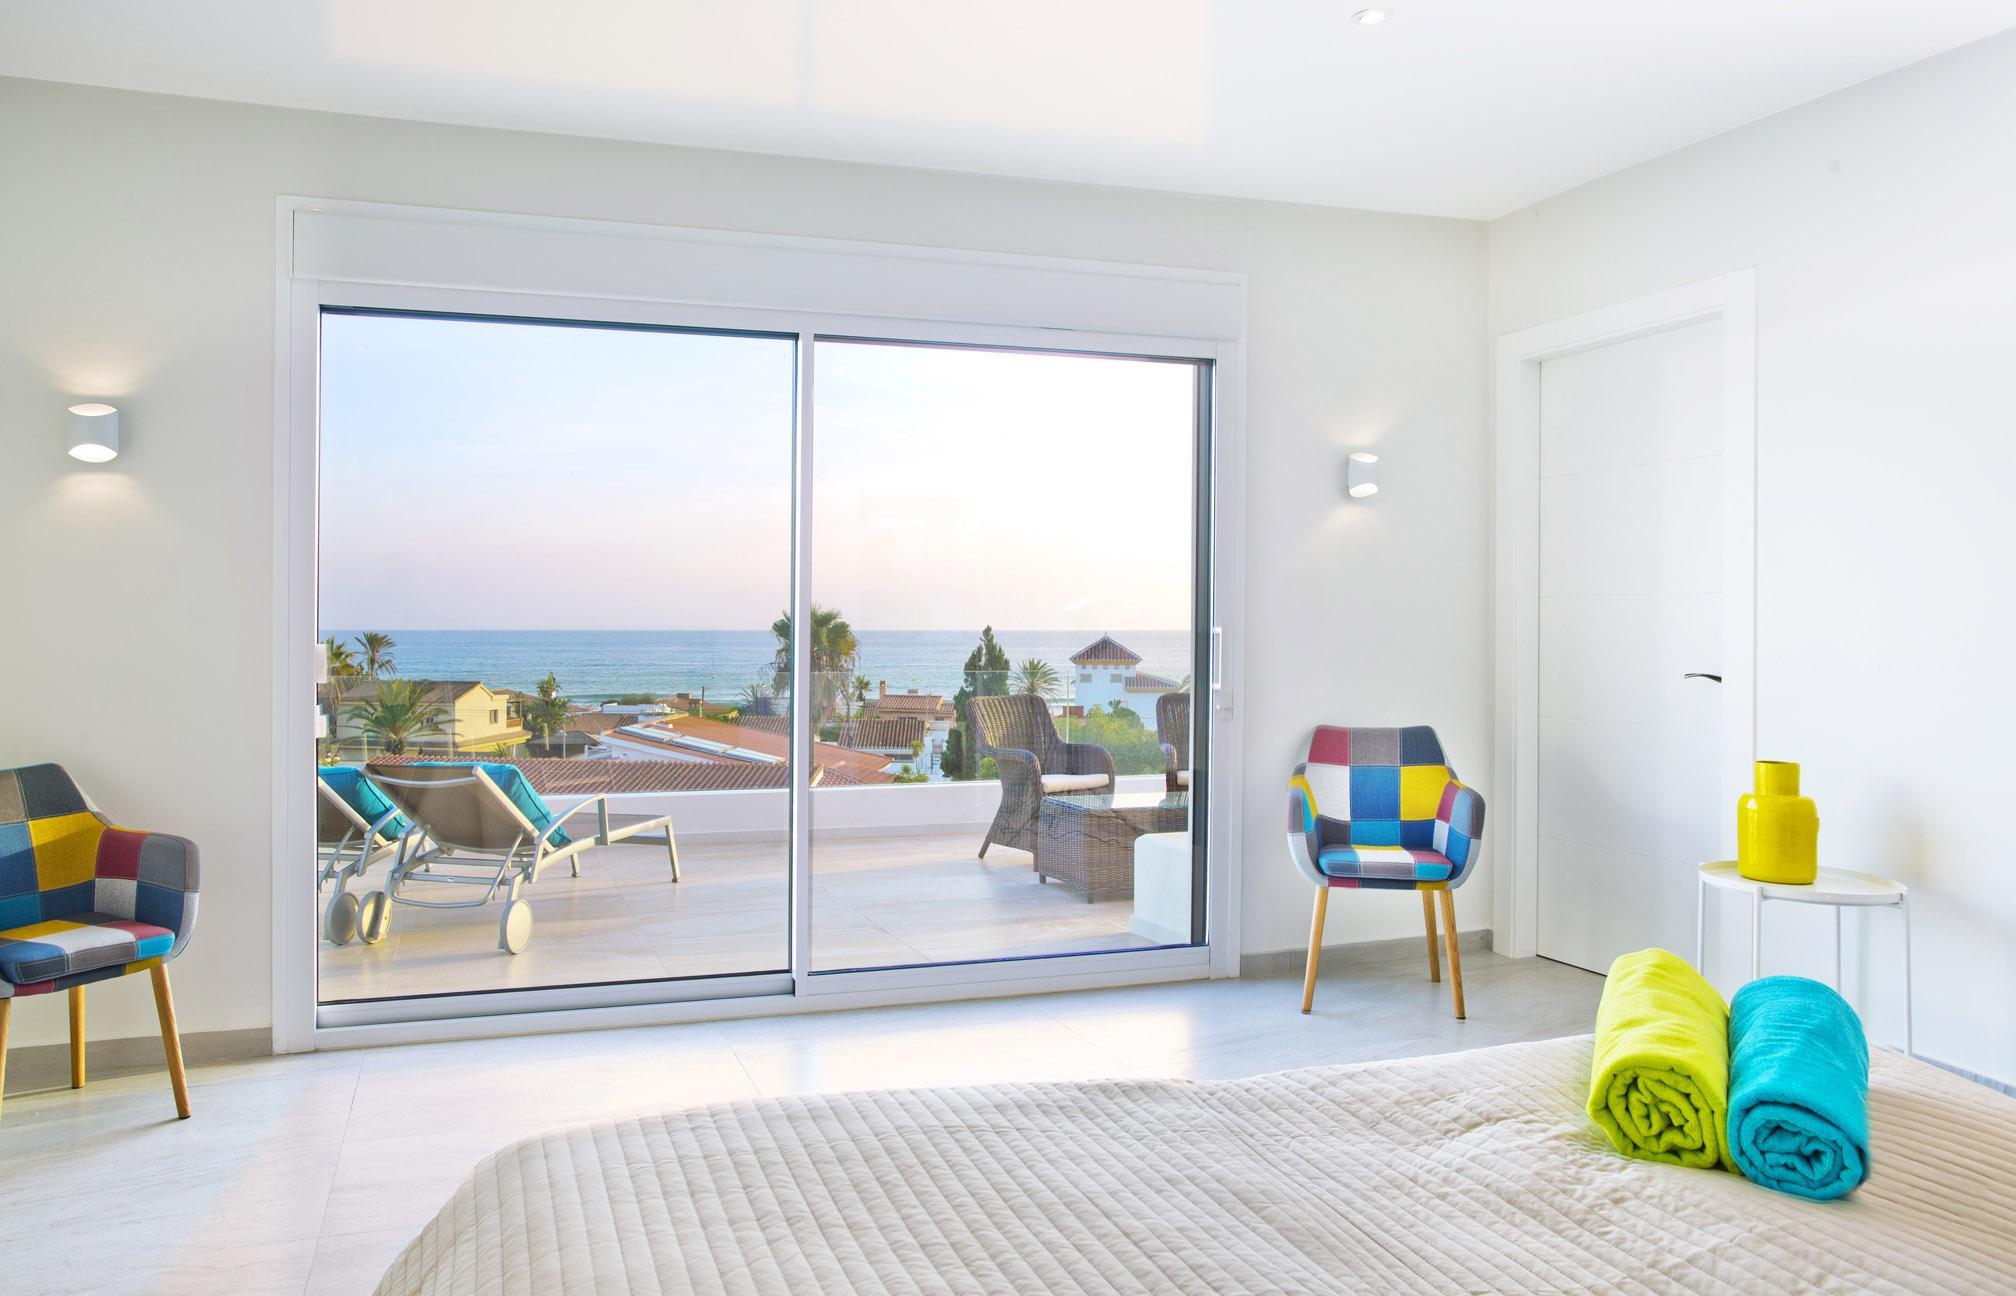 Villa Fossette, Luxury Villa available for Holiday Rental in Elviria, Marbella, Spain